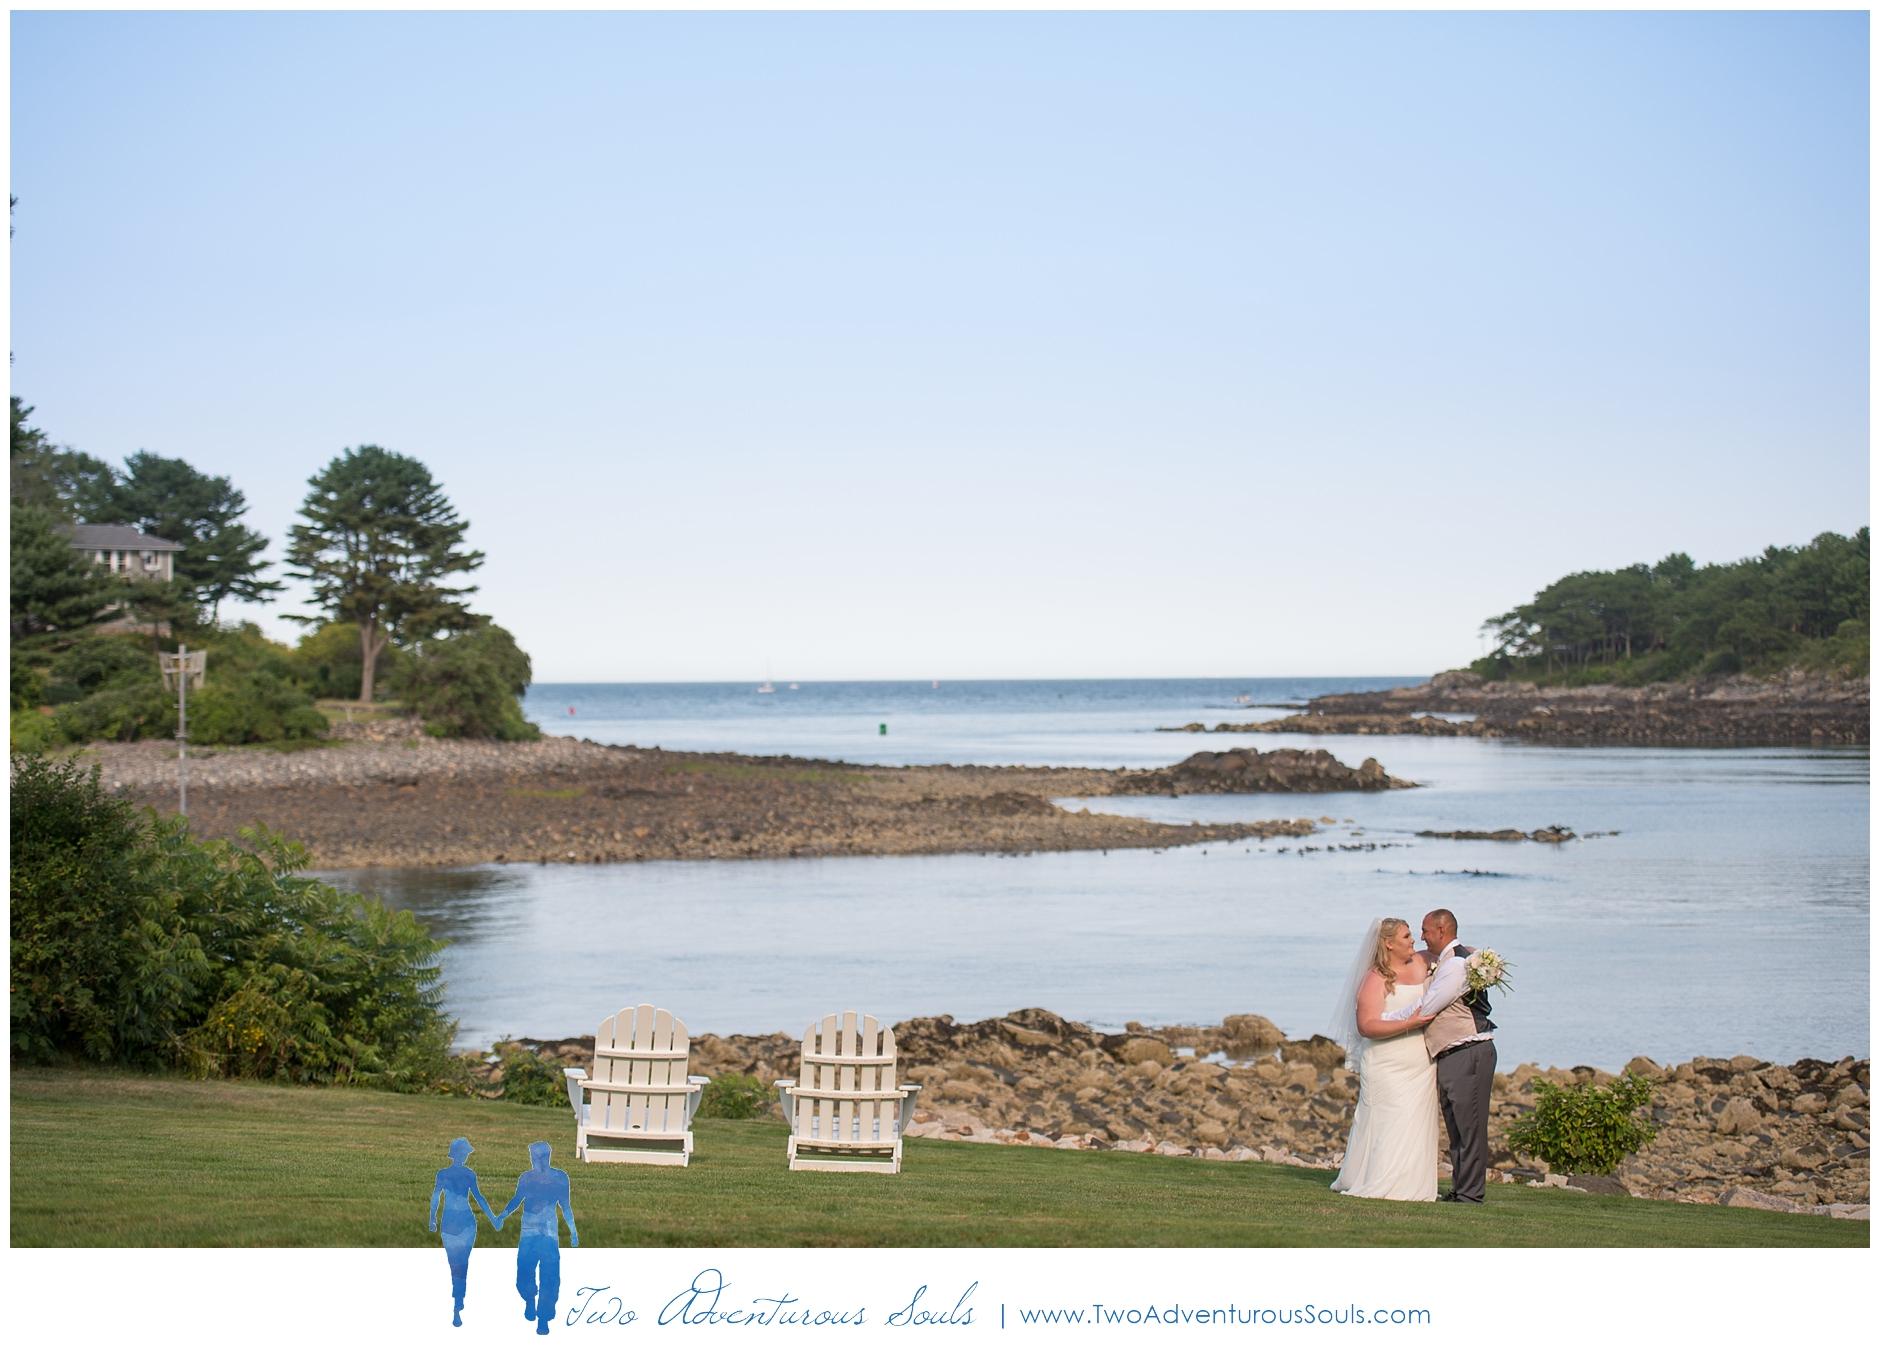 080417-Melissa-Dan-Sneaks-48_WEB-Maine-Wedding-and-Portrait-Photographer.jpg